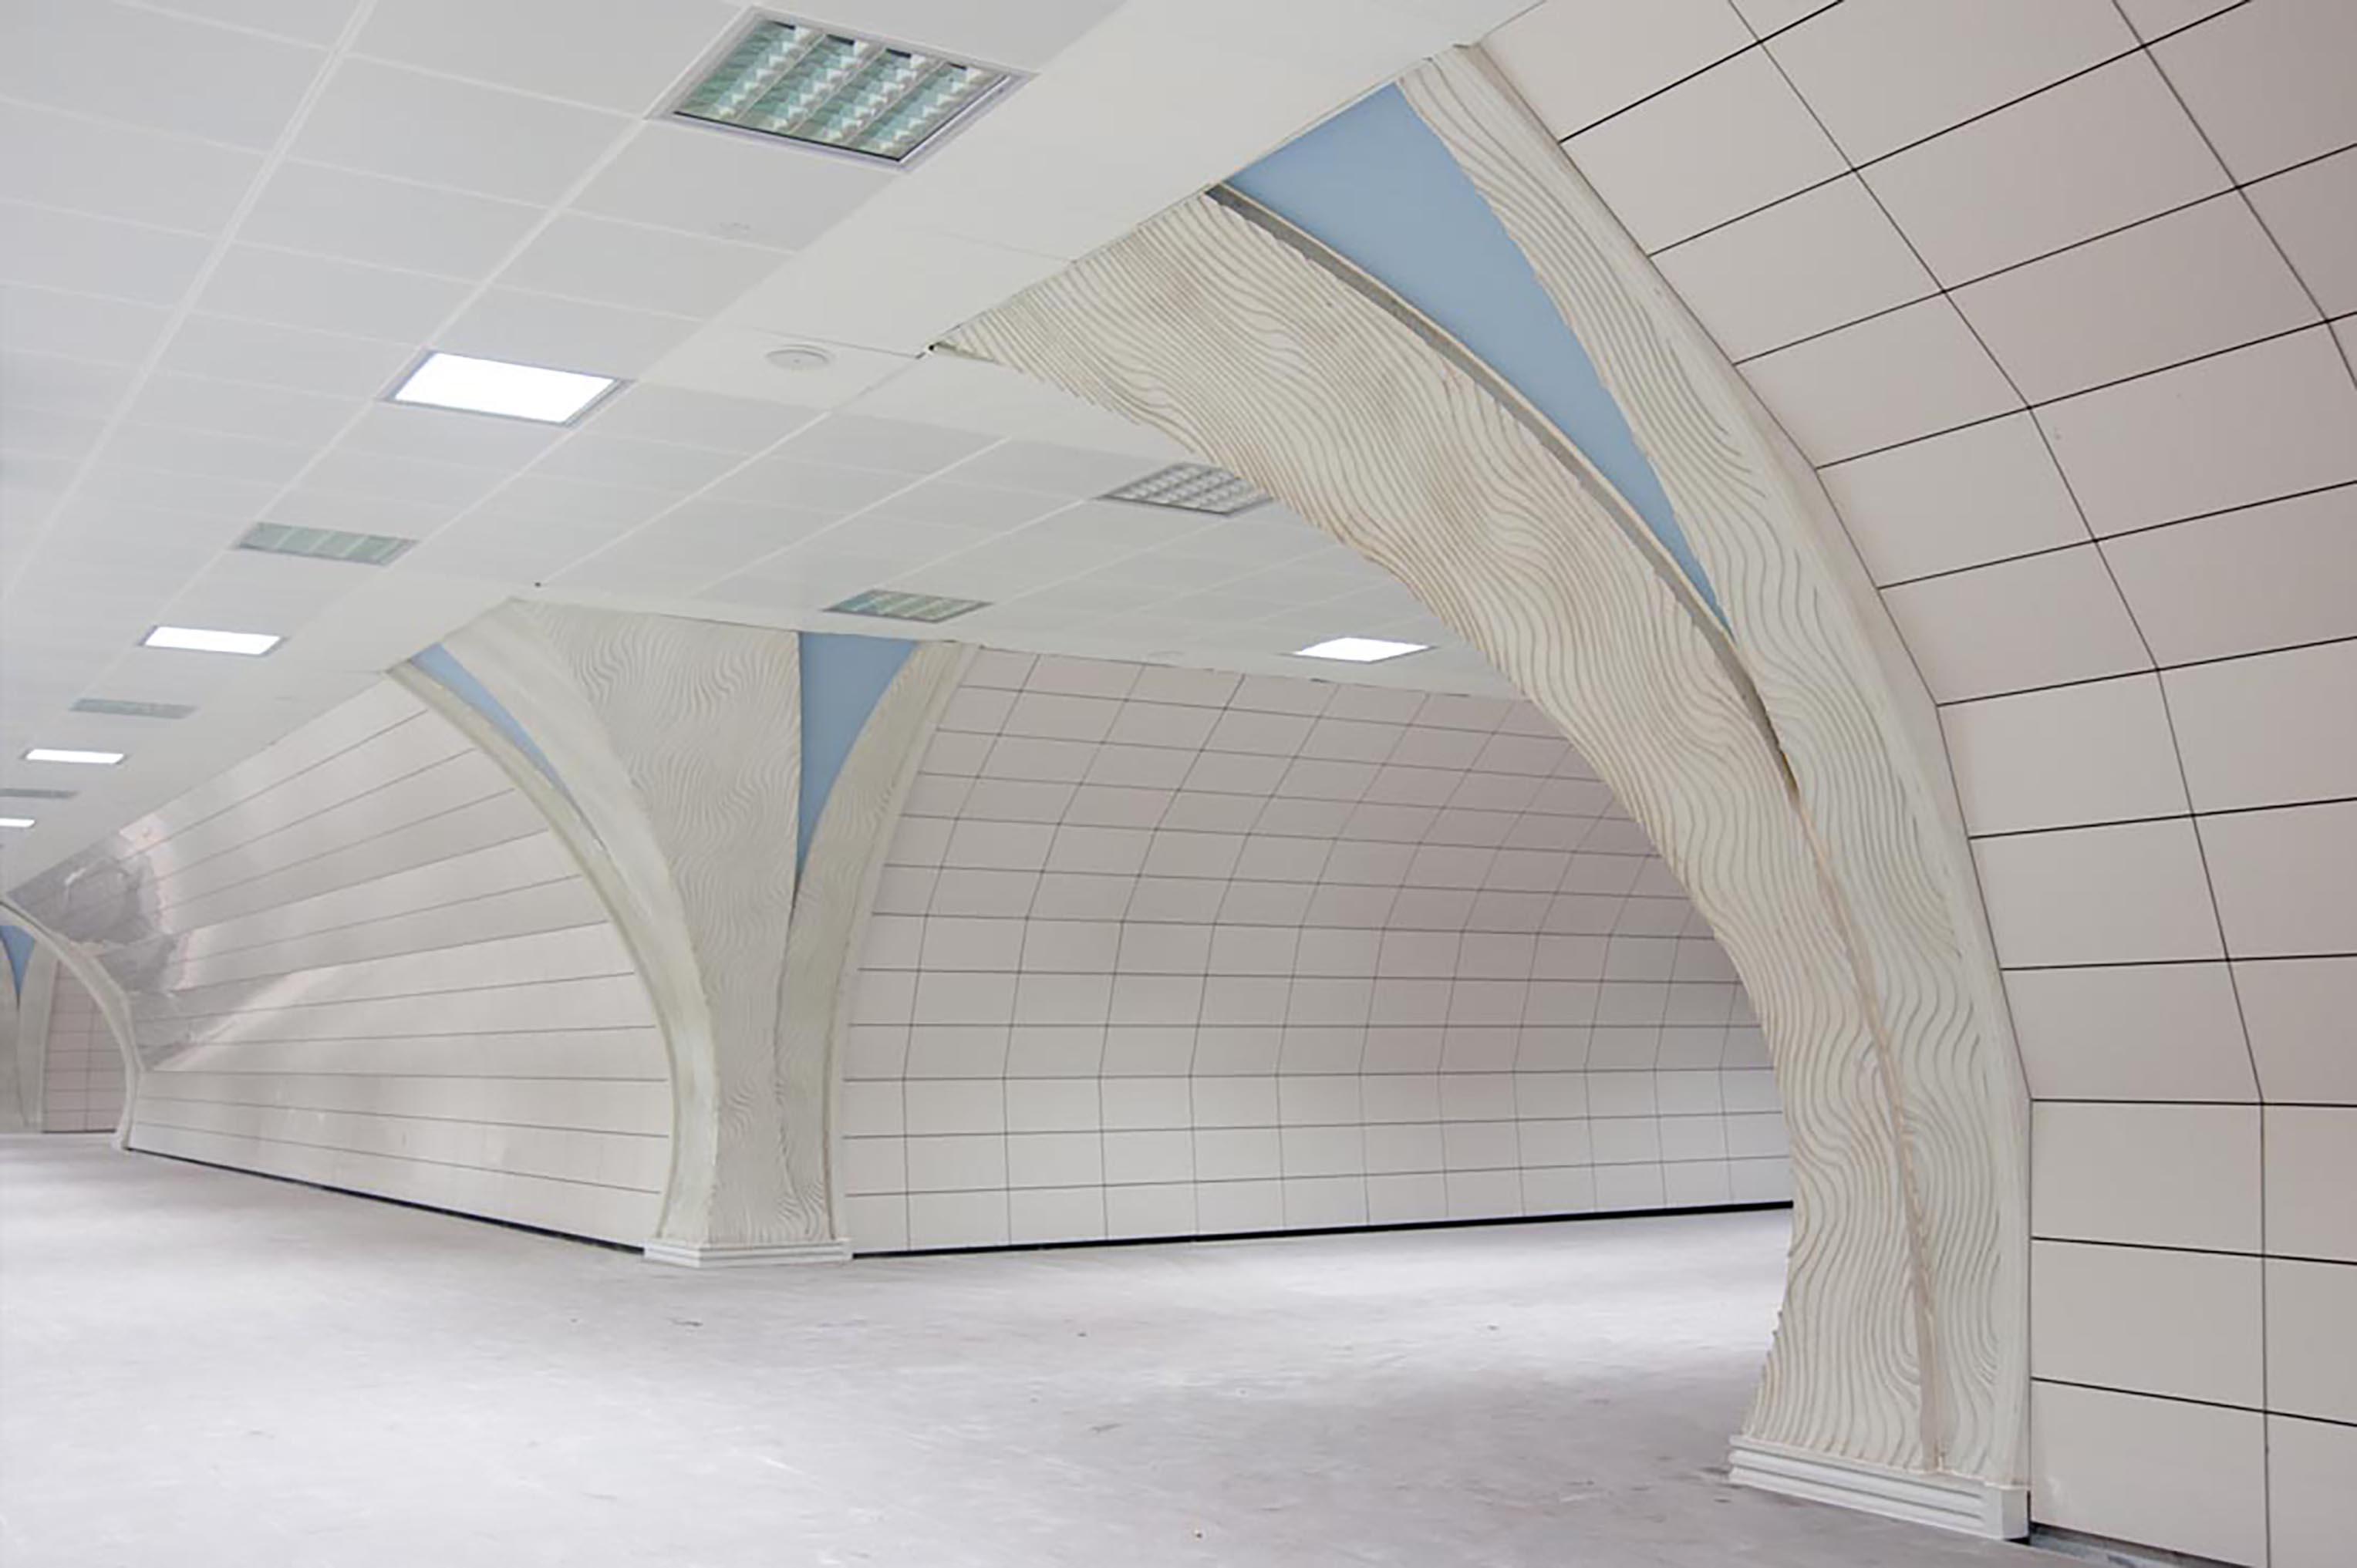 Fibrobeton Kadikoy-Tavşantepe Subway Line